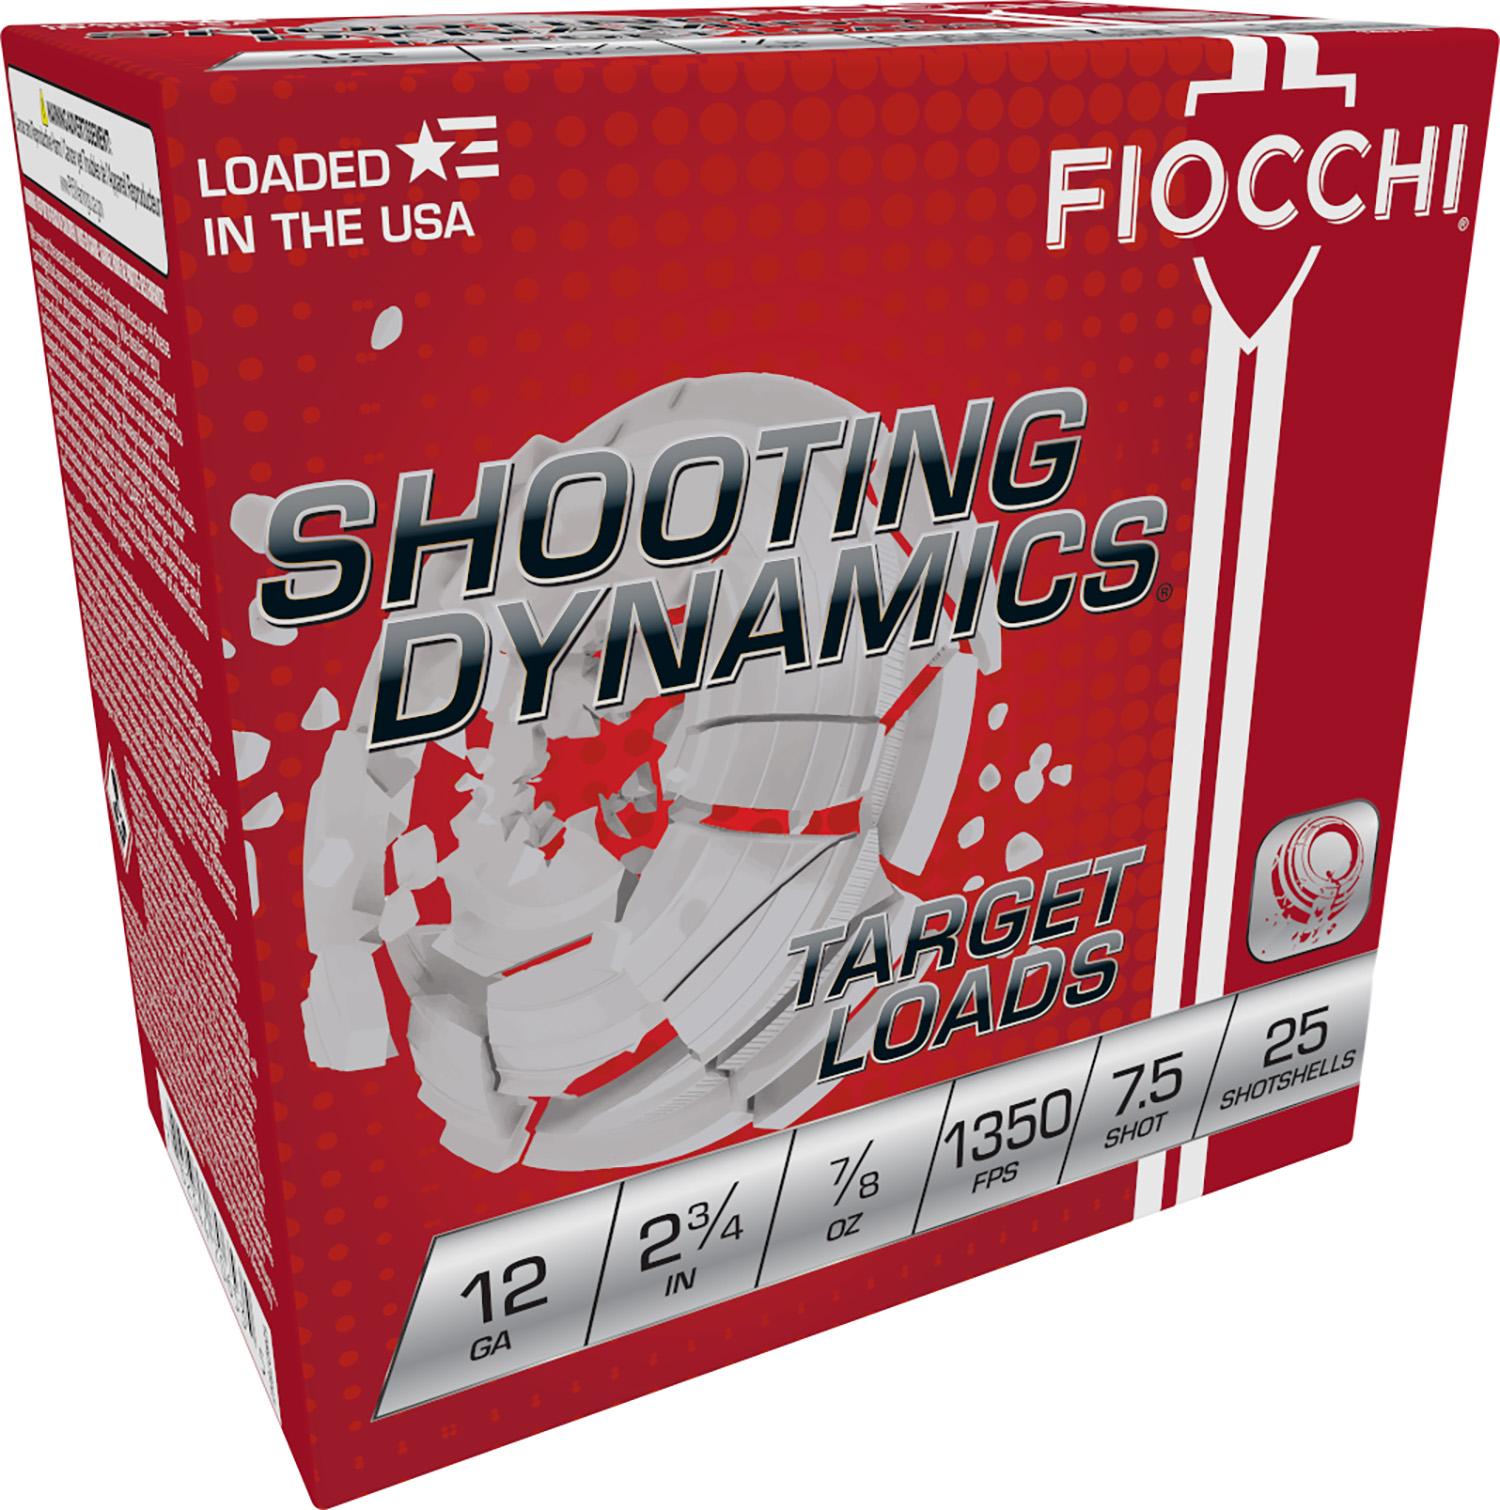 Fiocchi 12SD78H75 Shooting Dynamics Semi-Auto Friendly 12 Gauge 2.75